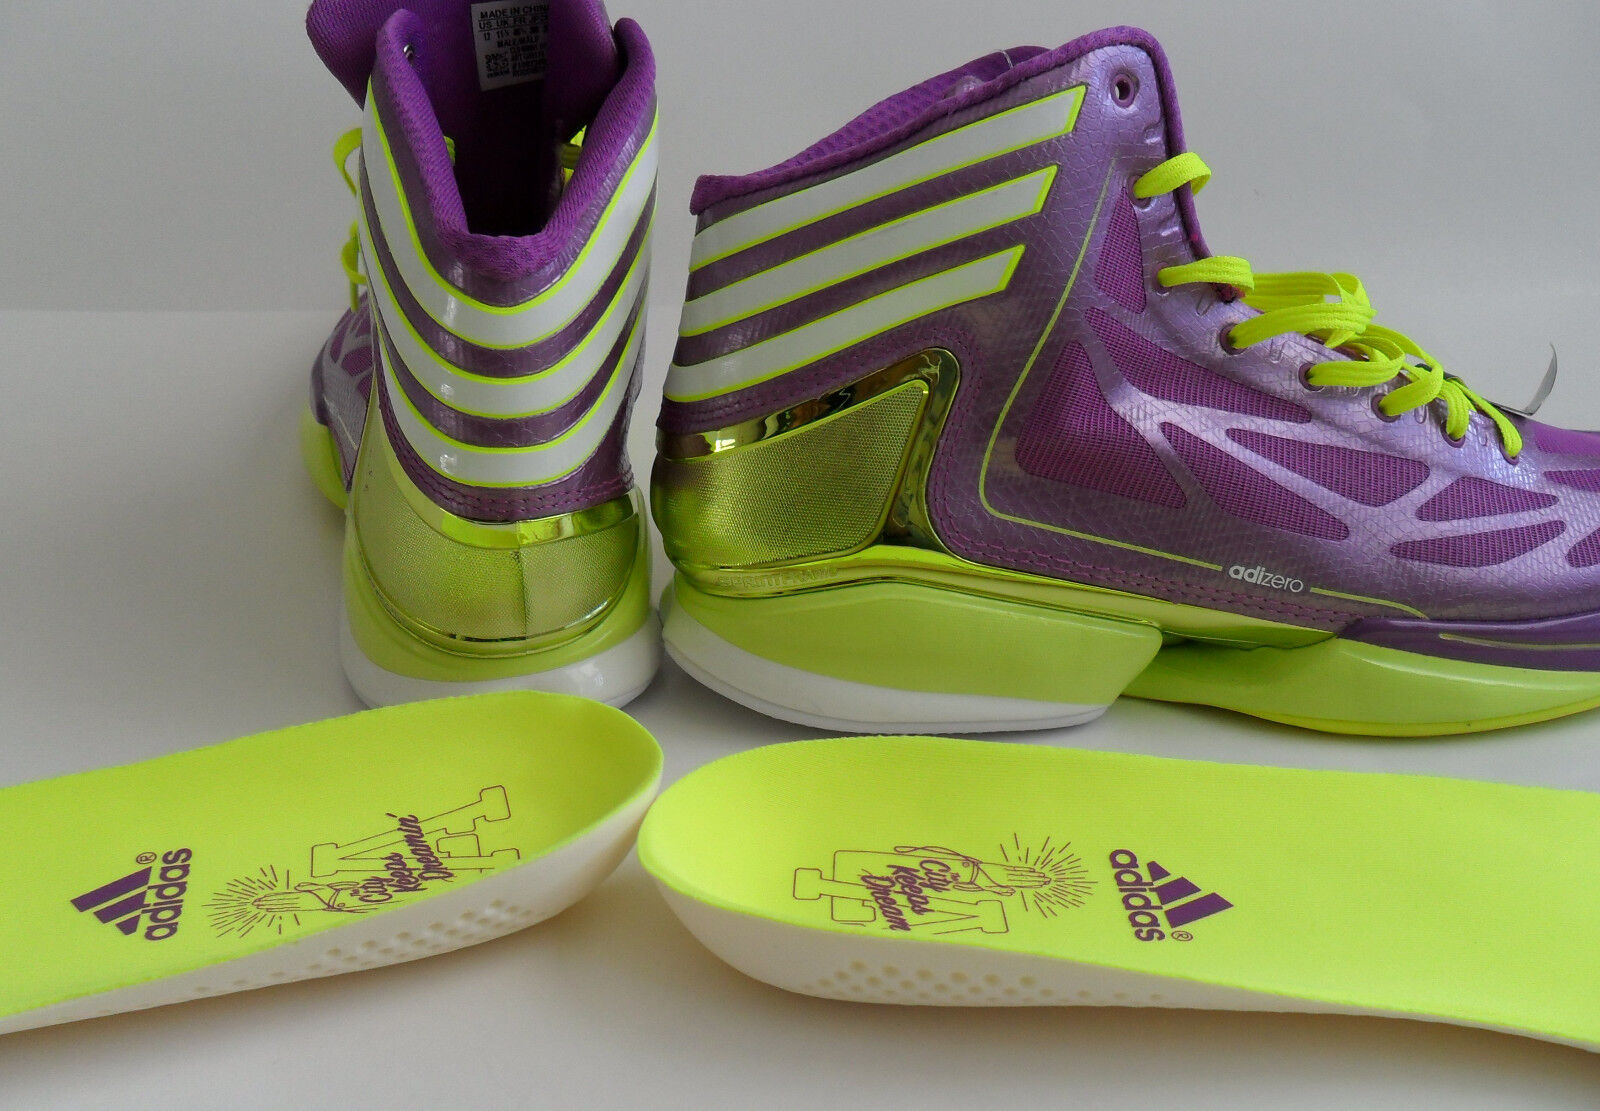 Neue - adidas adizero verrückte licht 2 la dream city city city basketball - schuhe rose - mens größe 9. 76fb8d